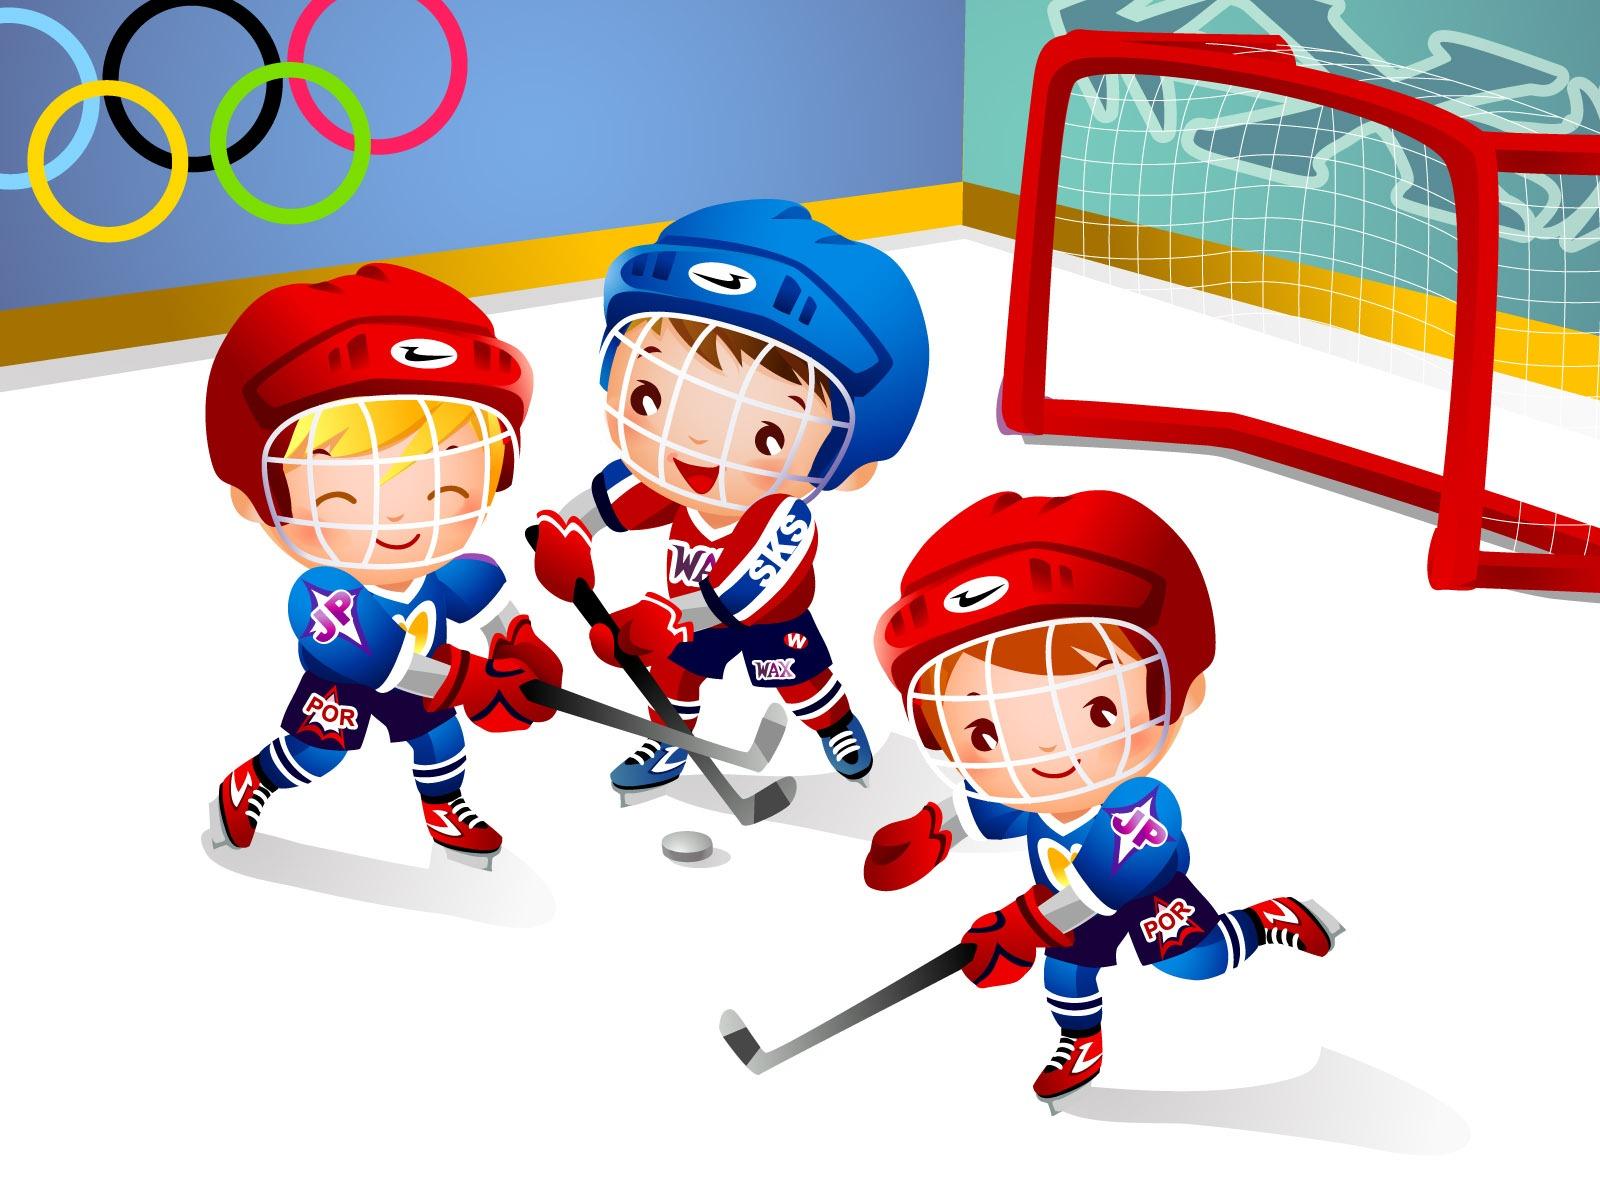 по теме: детский спорт ...: www.olpictures.ru/kartinki-detskie-sport.html